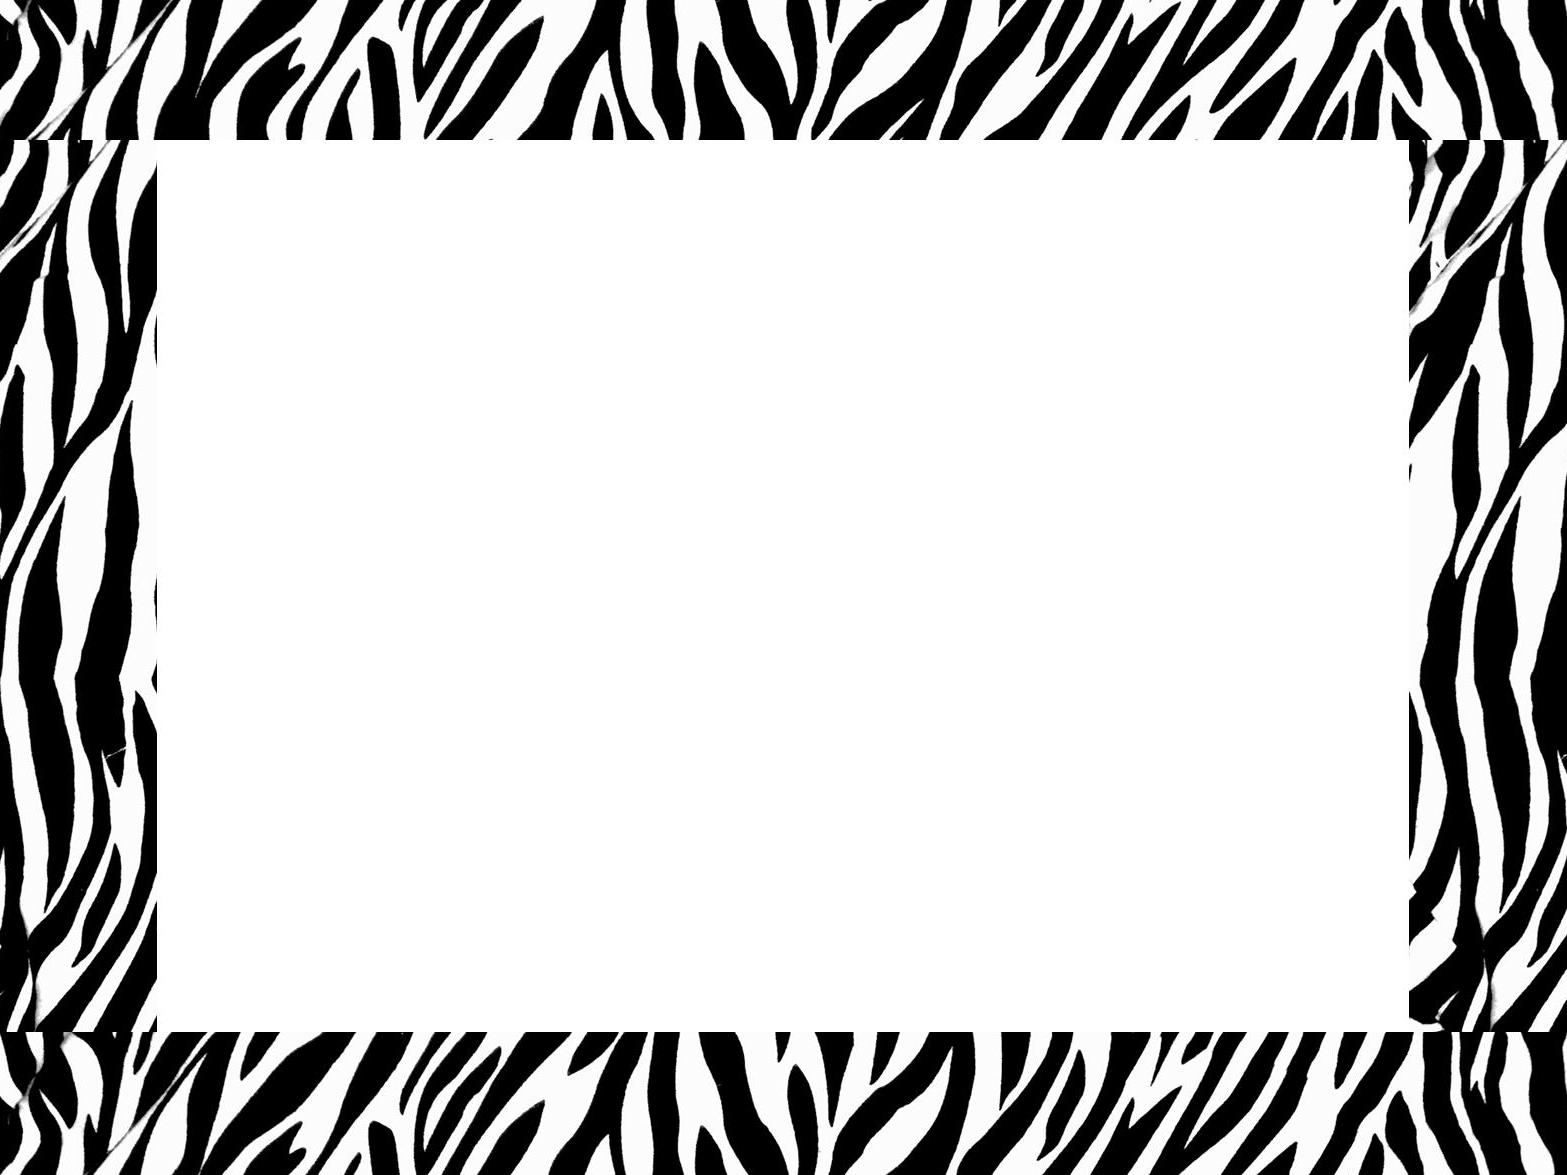 8 Images of Zebra Border Paper Printable